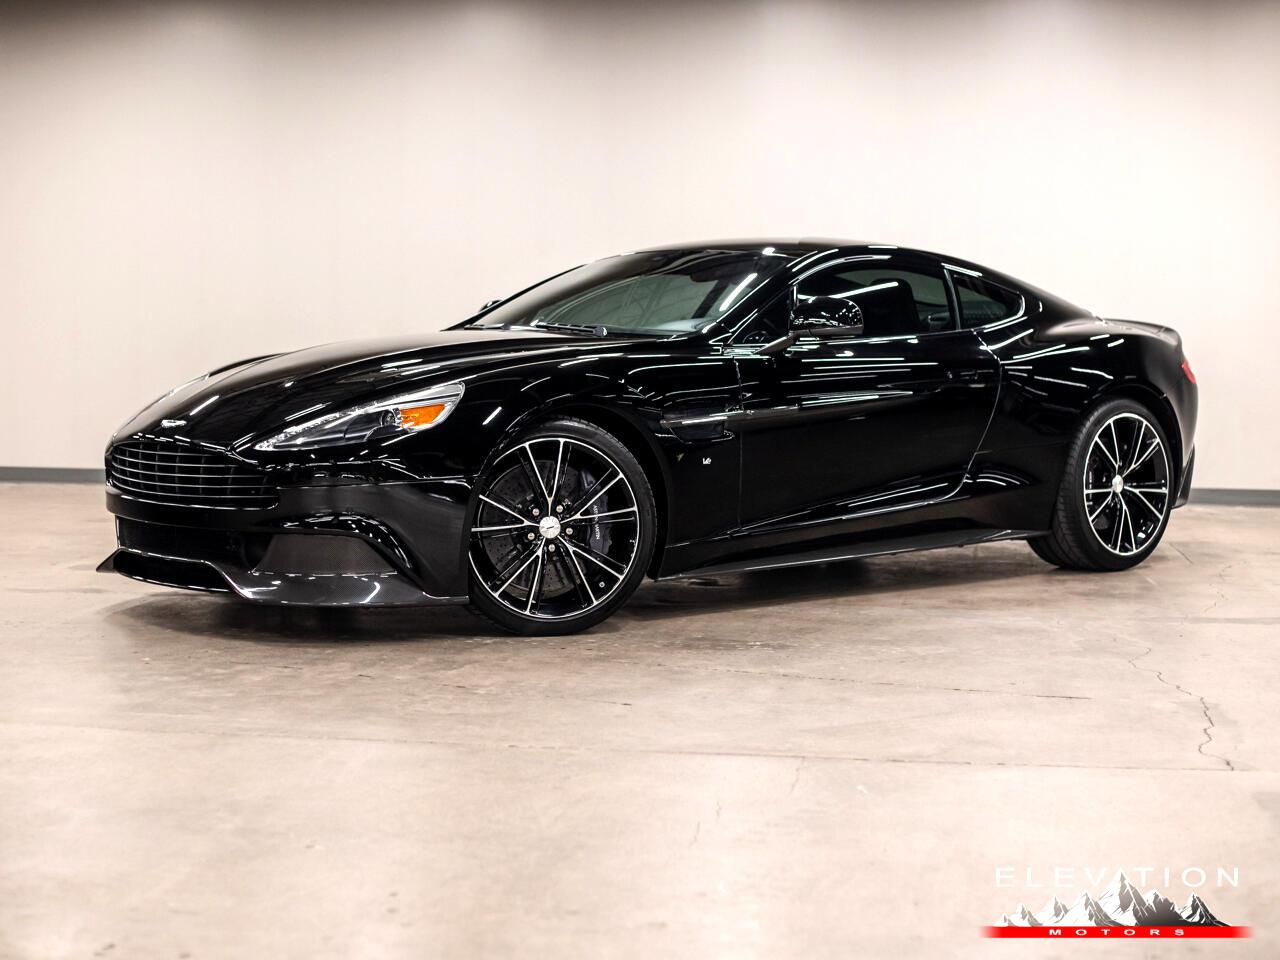 Aston Martin Vanquish Coupe 2016